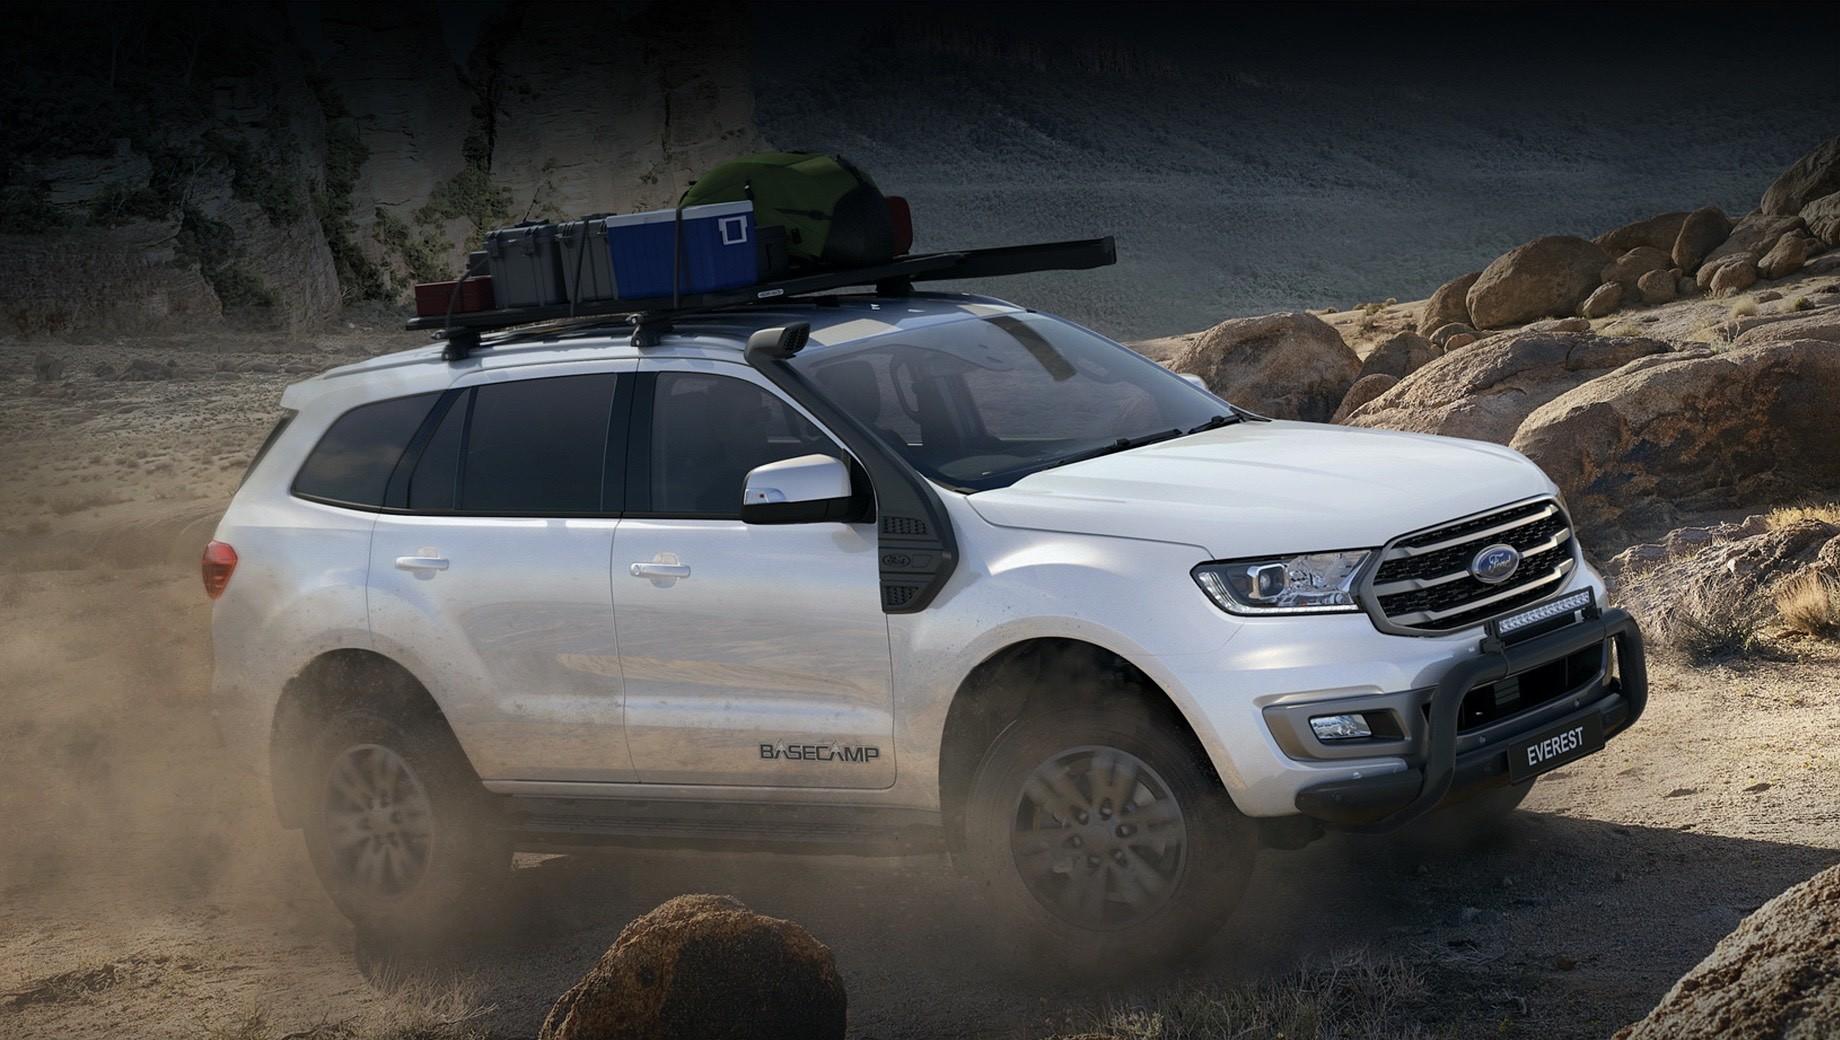 Австралийский Ford Everest BaseCamp позвал в путешествие